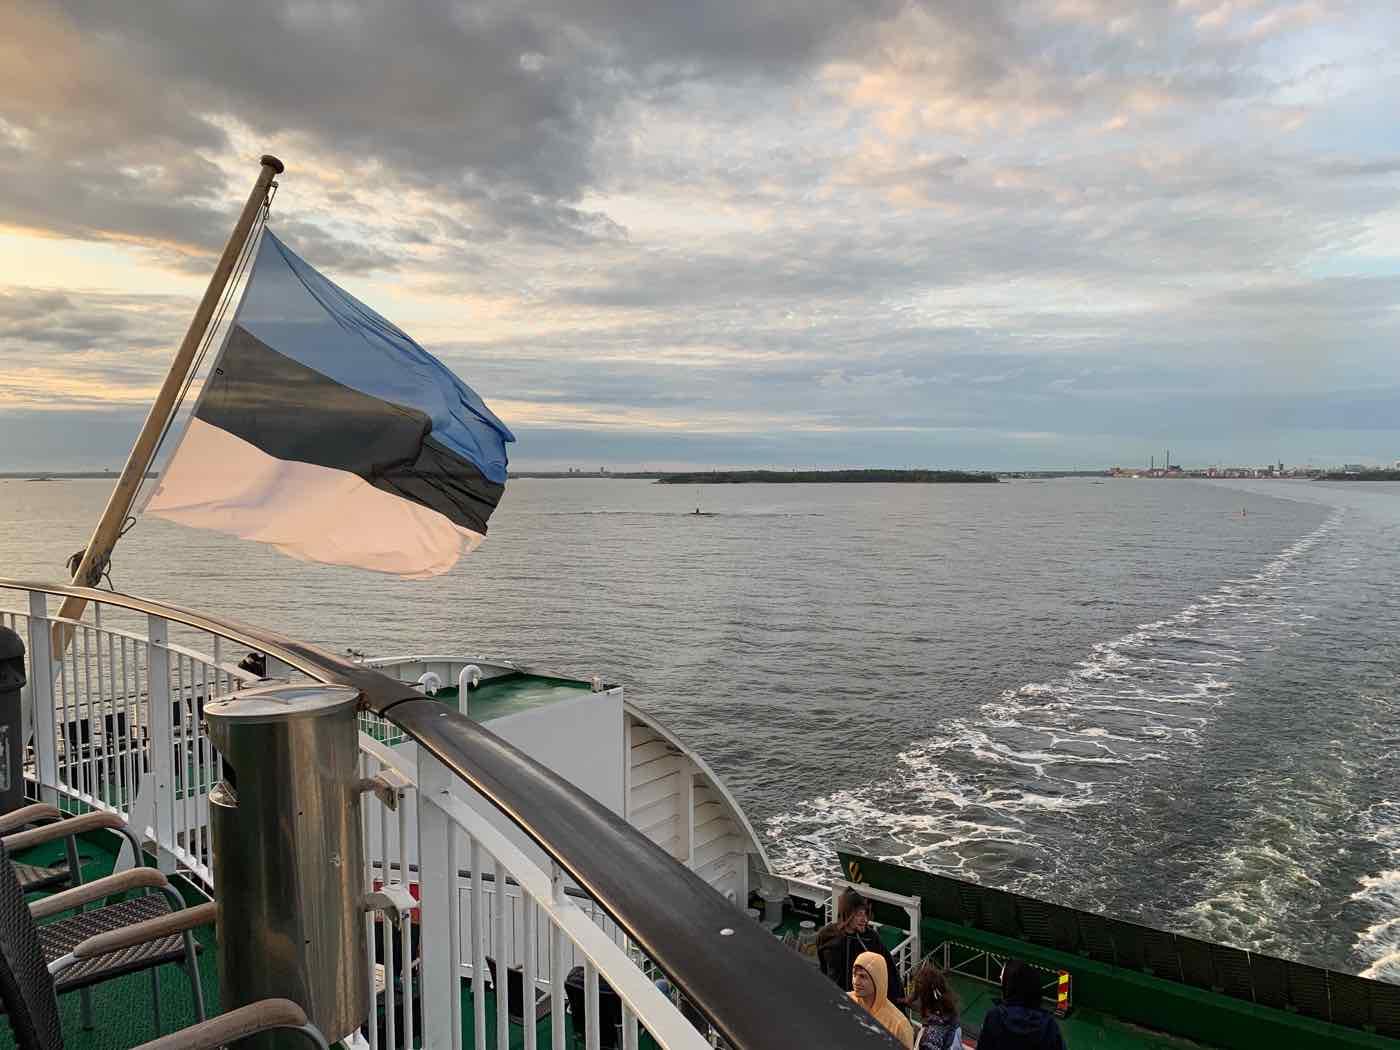 helsinki day trip from tallinn tallink ferry